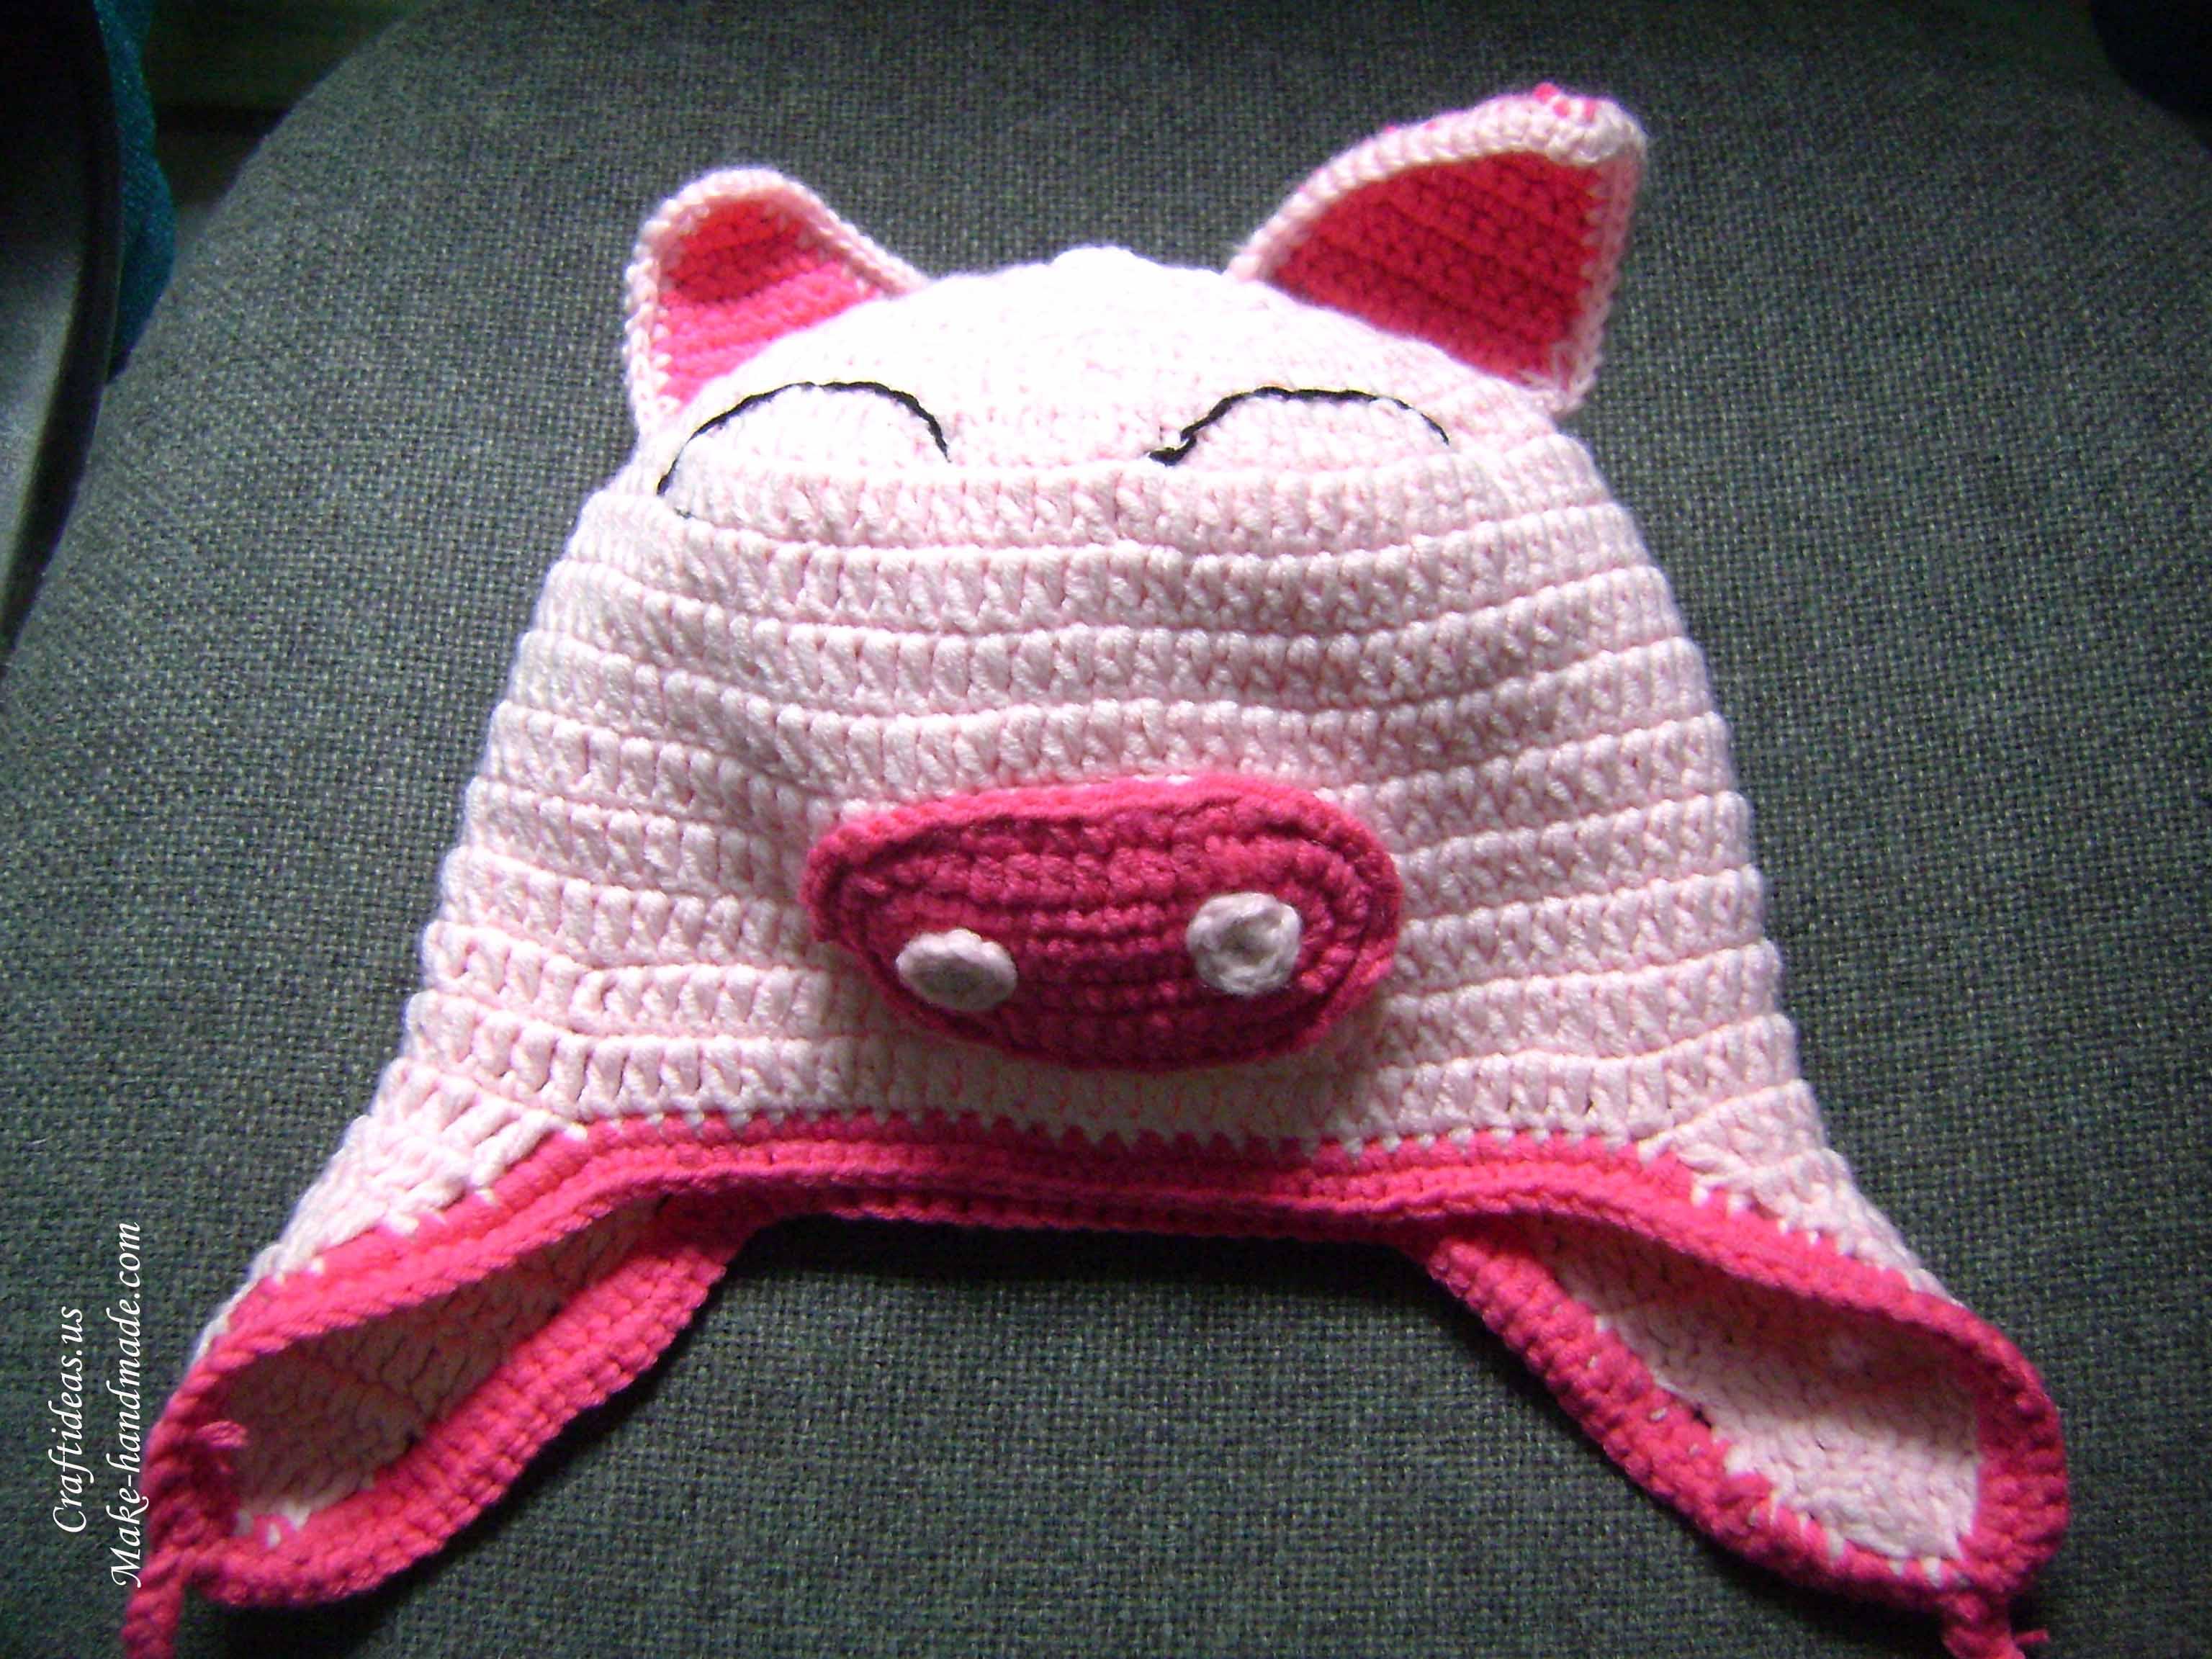 Crochet Pattern Pig Hat : Crochet Pig Hat www.imgkid.com - The Image Kid Has It!